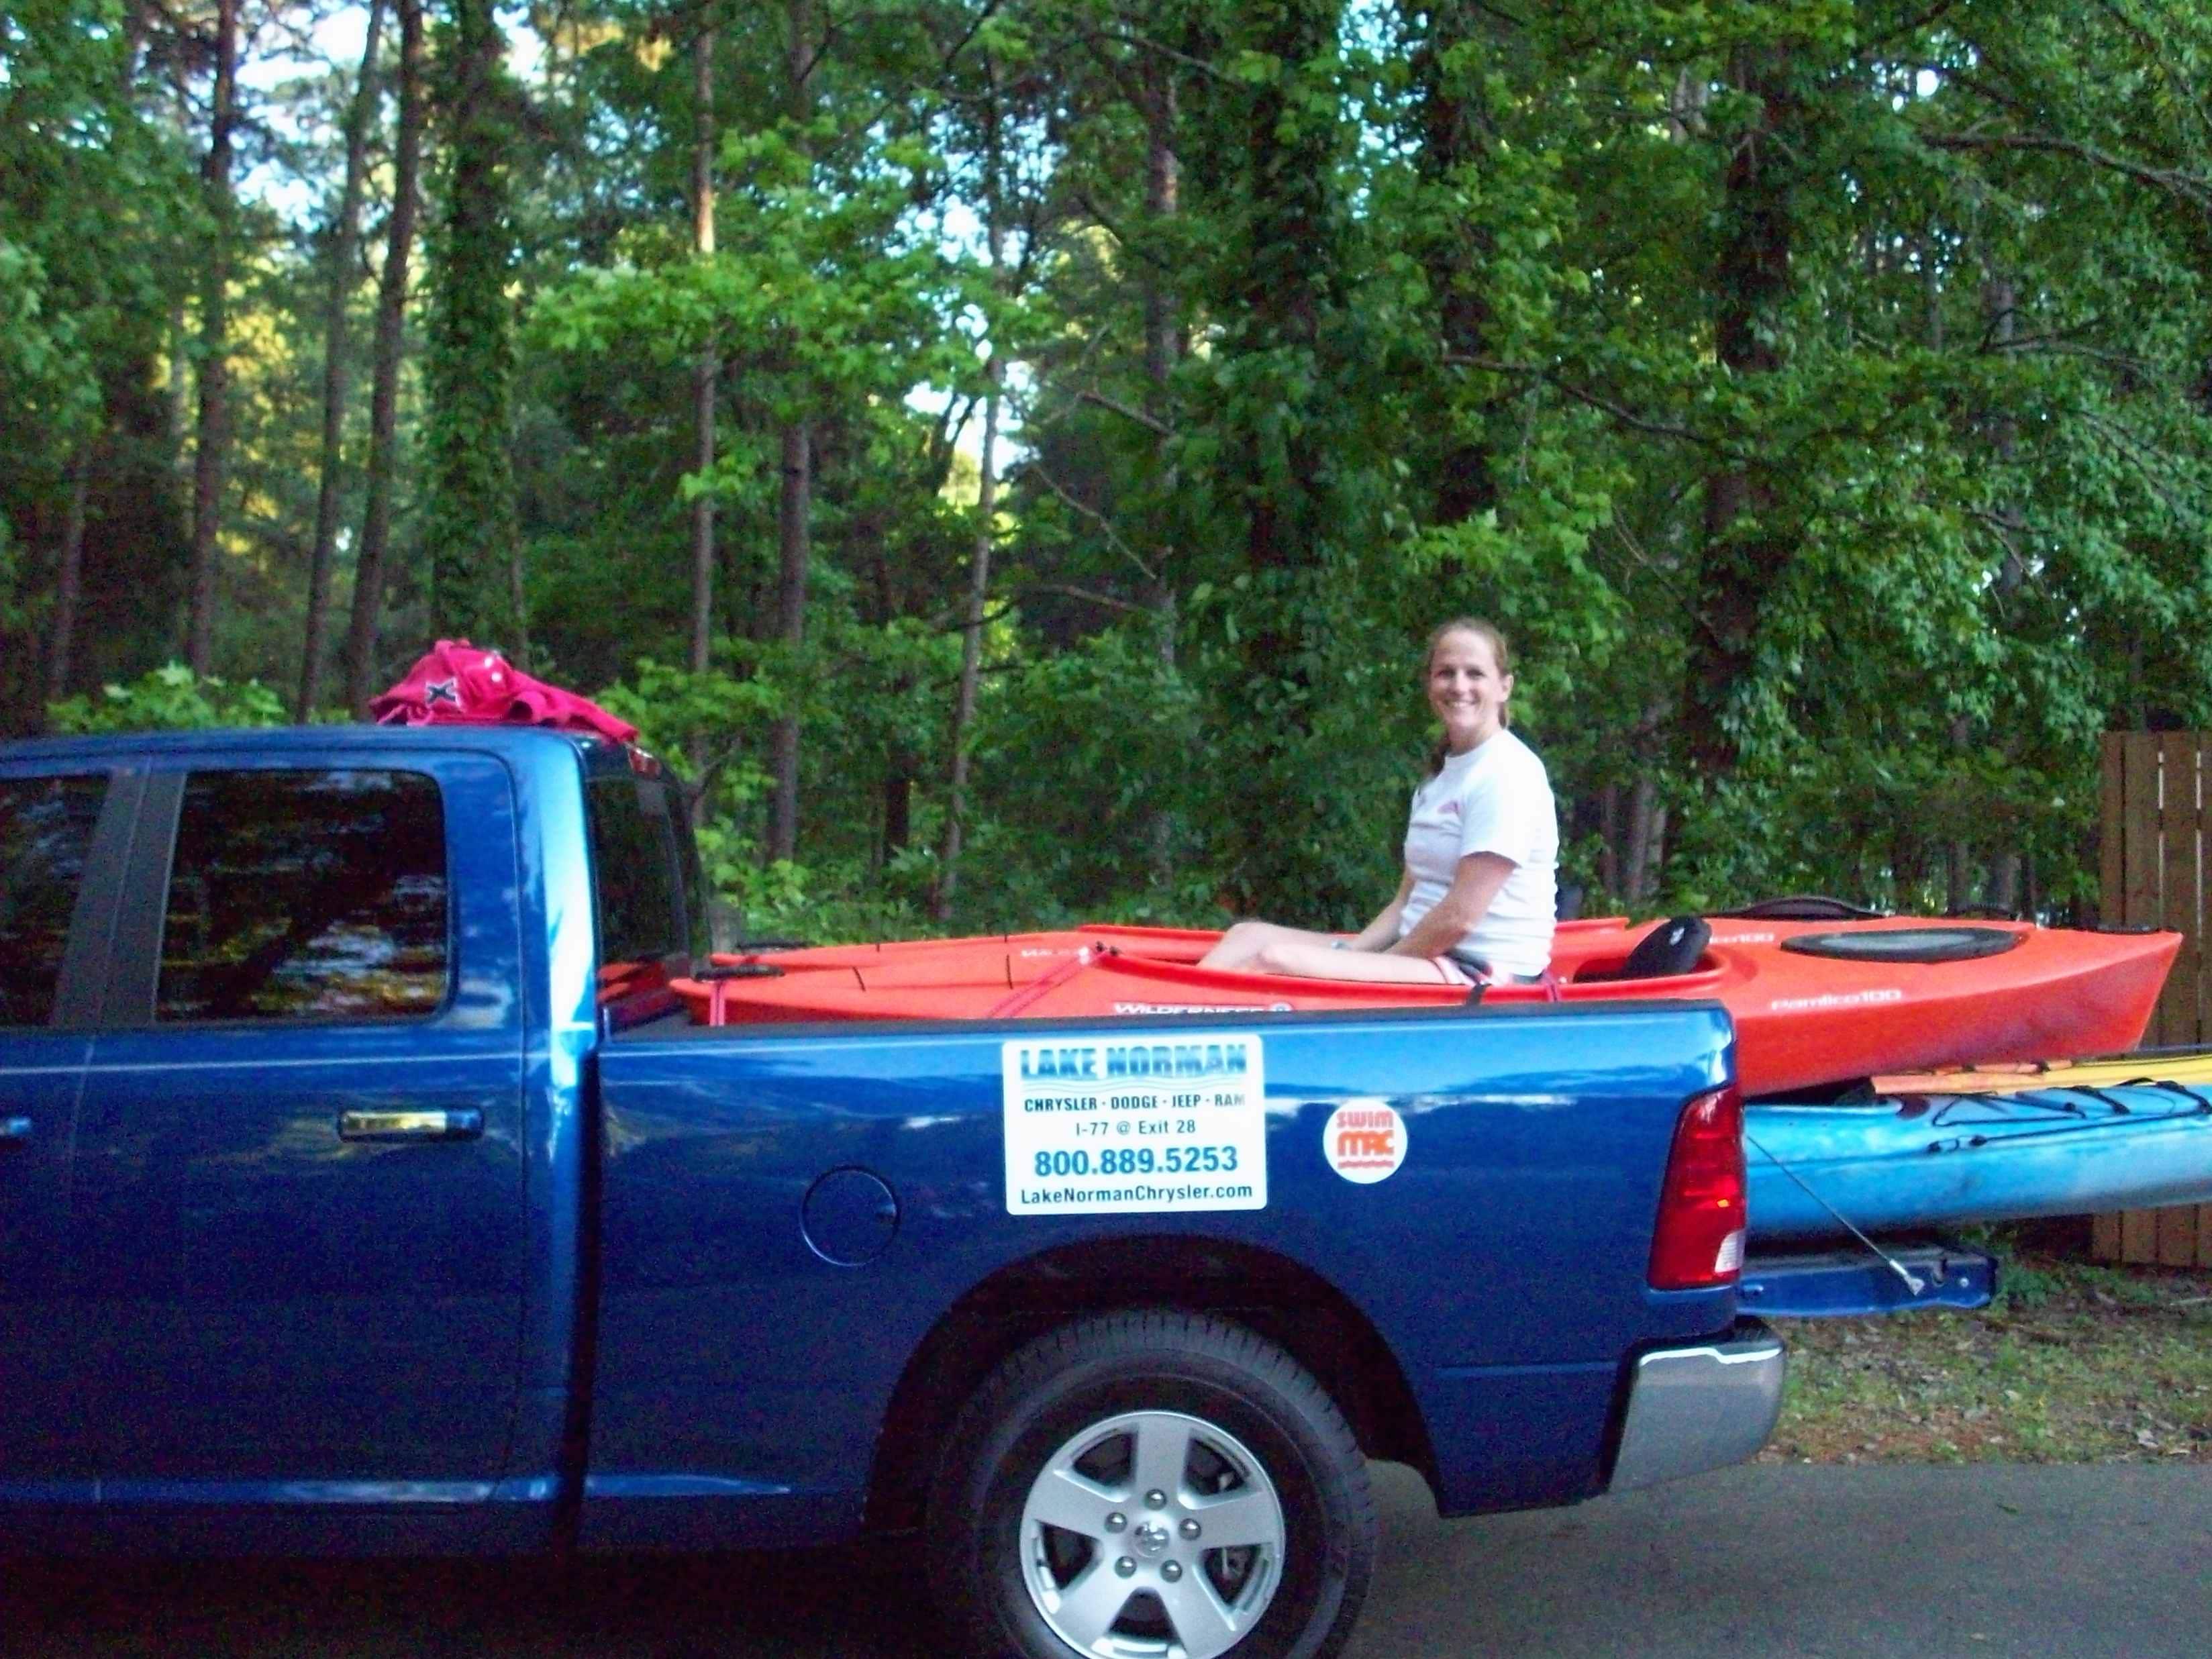 helping our community 888 710 1785 lake norman chrysler dodge jeep ram. Black Bedroom Furniture Sets. Home Design Ideas